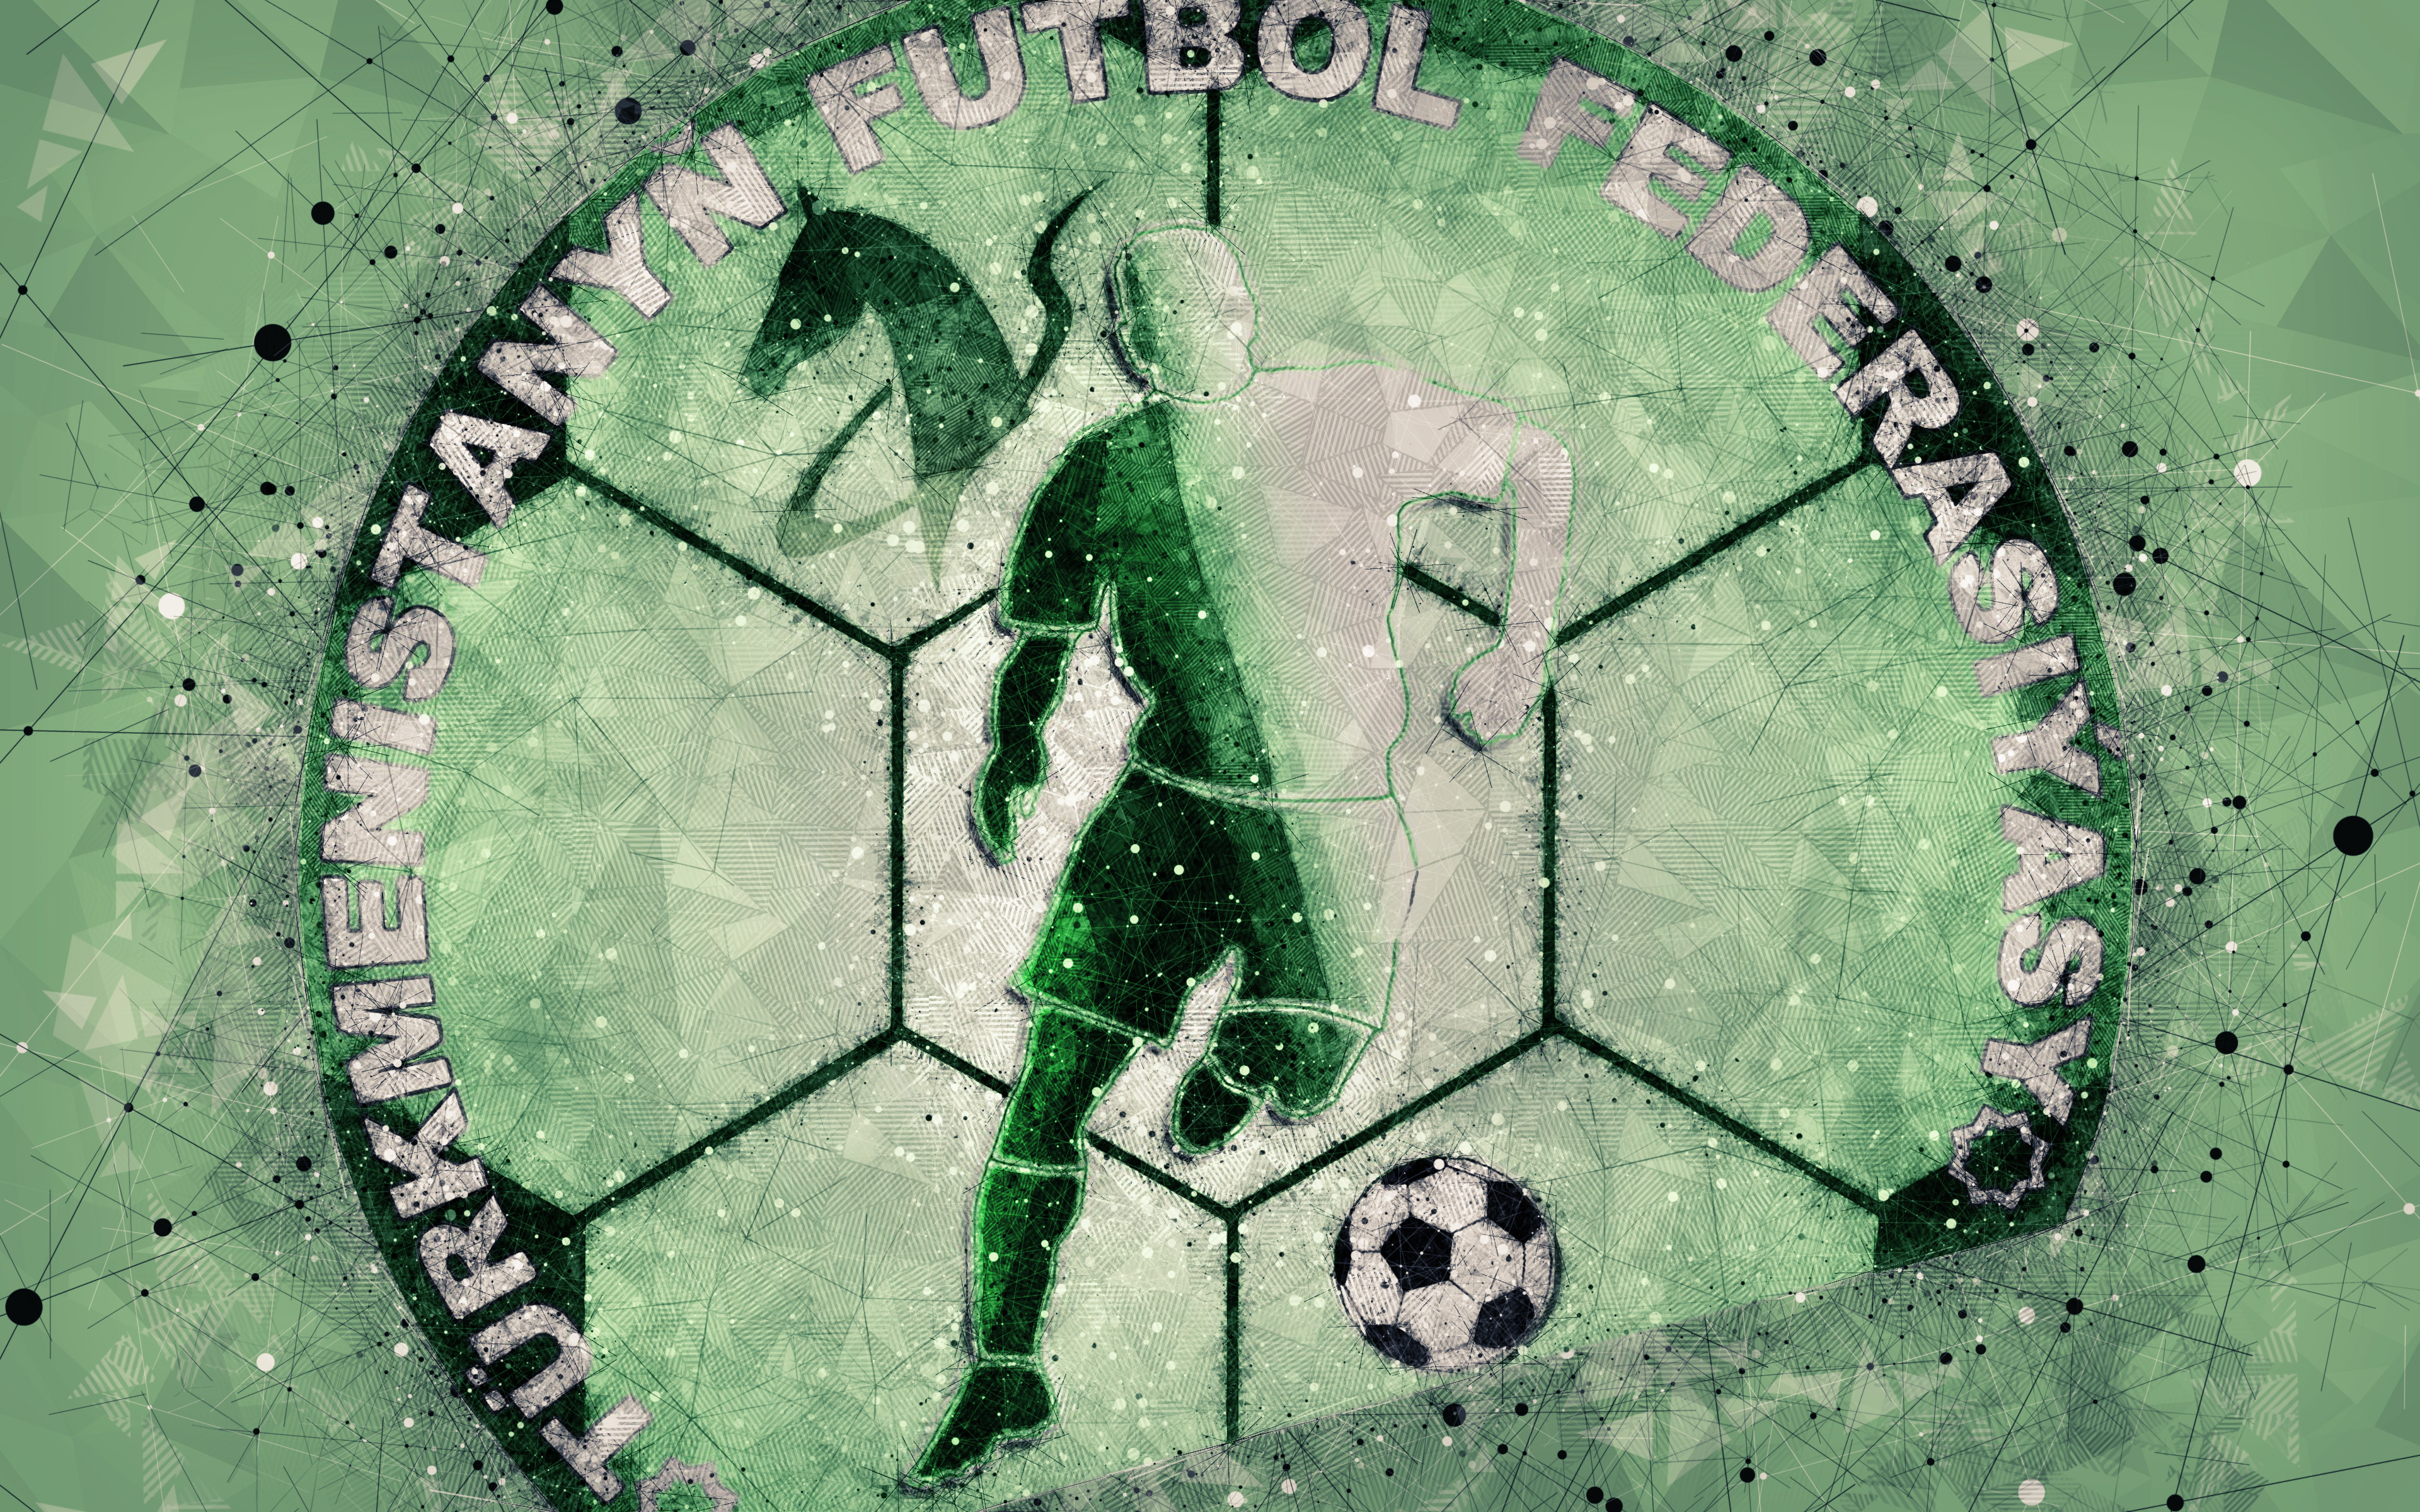 Turkmenistan National Football Team 4k Ultra Hd Wallpaper Background Image 3840x2400 Id 979884 Wallpaper Abyss